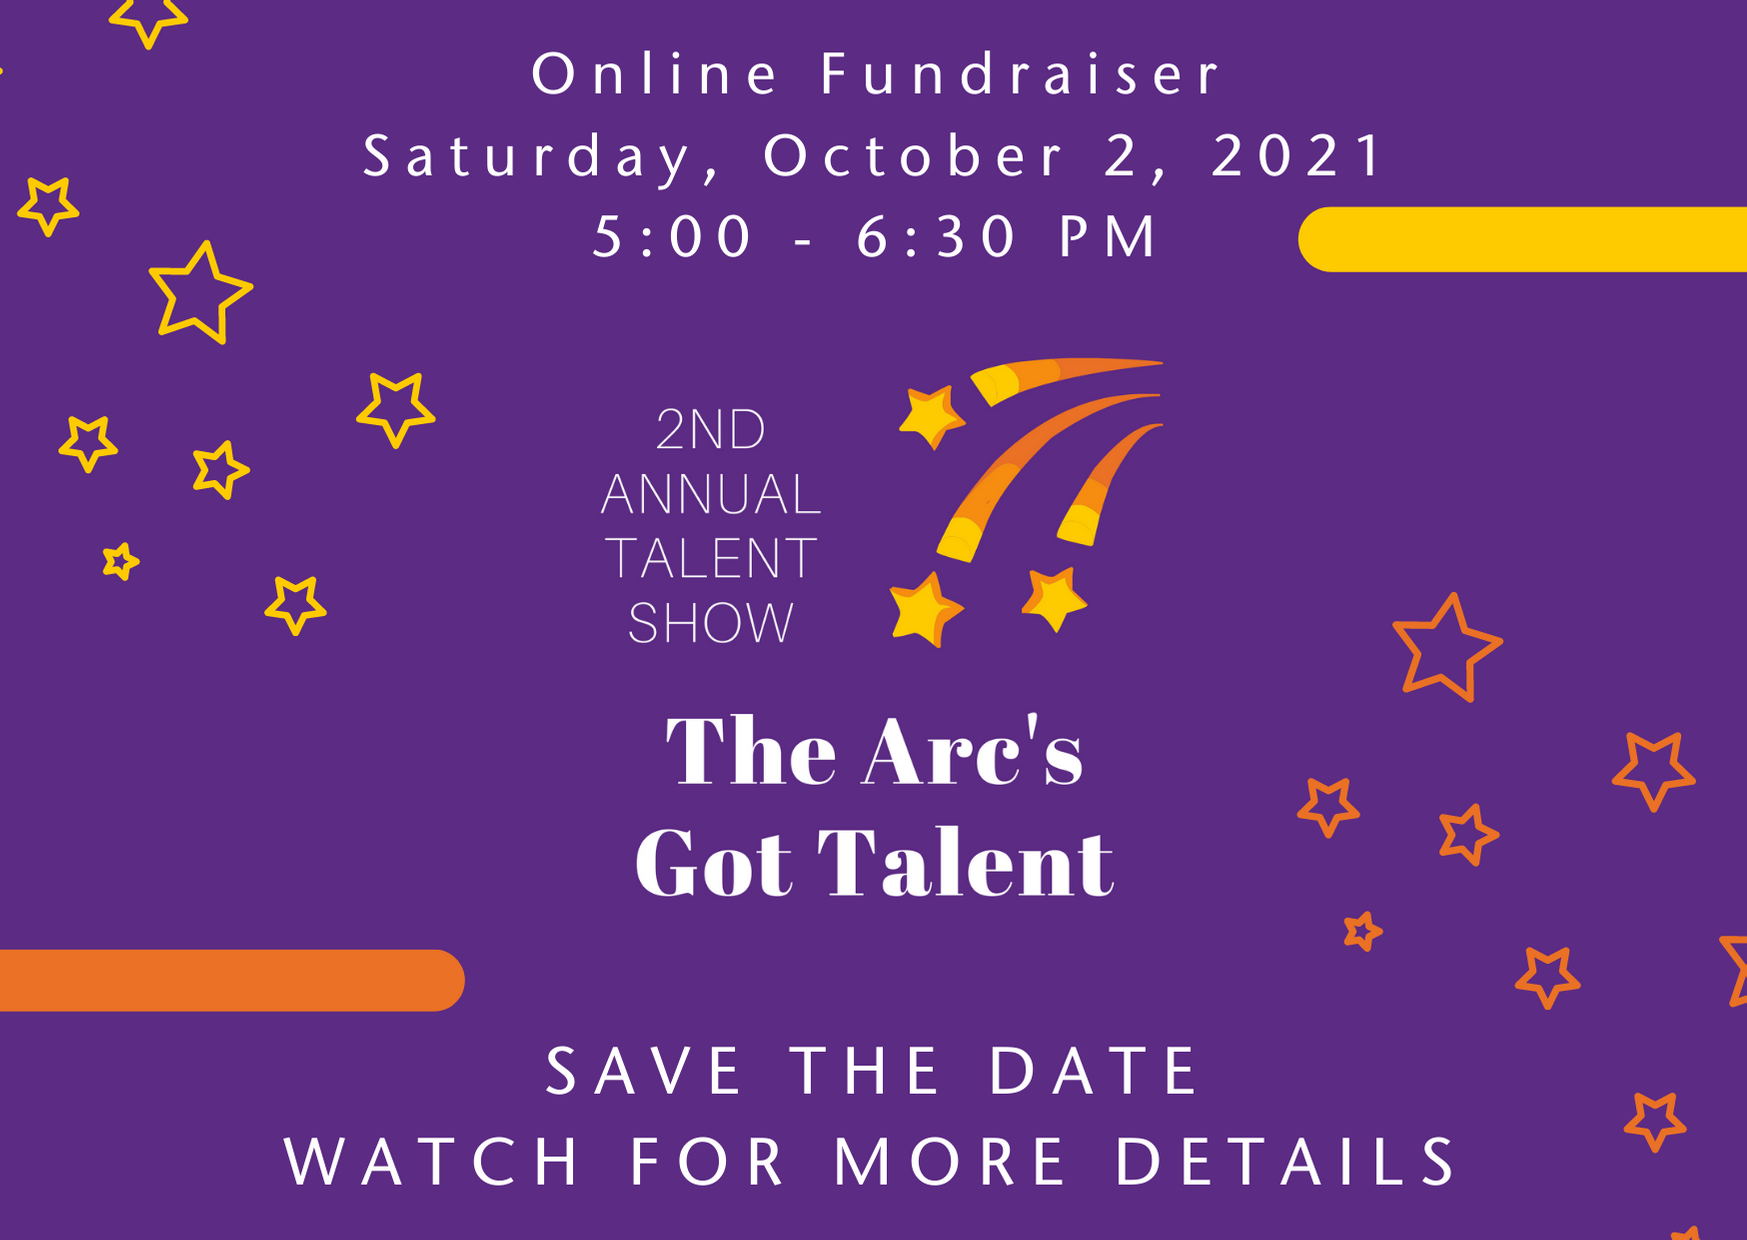 Recruiting The Arc's Got Talent Participants